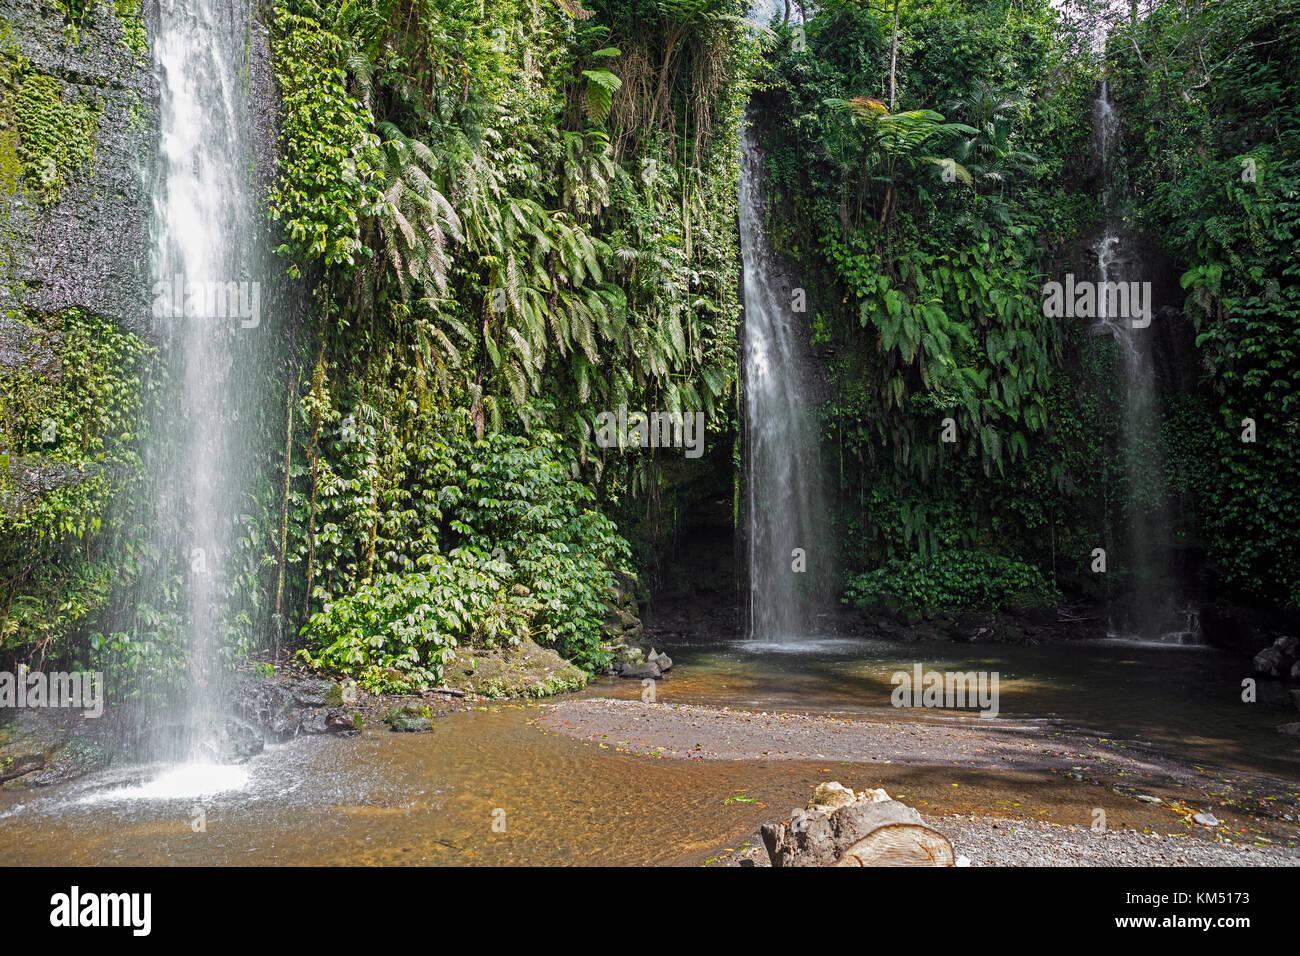 Benang kelambu cascadas en el bosque tropical cerca de la aldea de aik berik, norte, central batukliang Lombok, Imagen De Stock